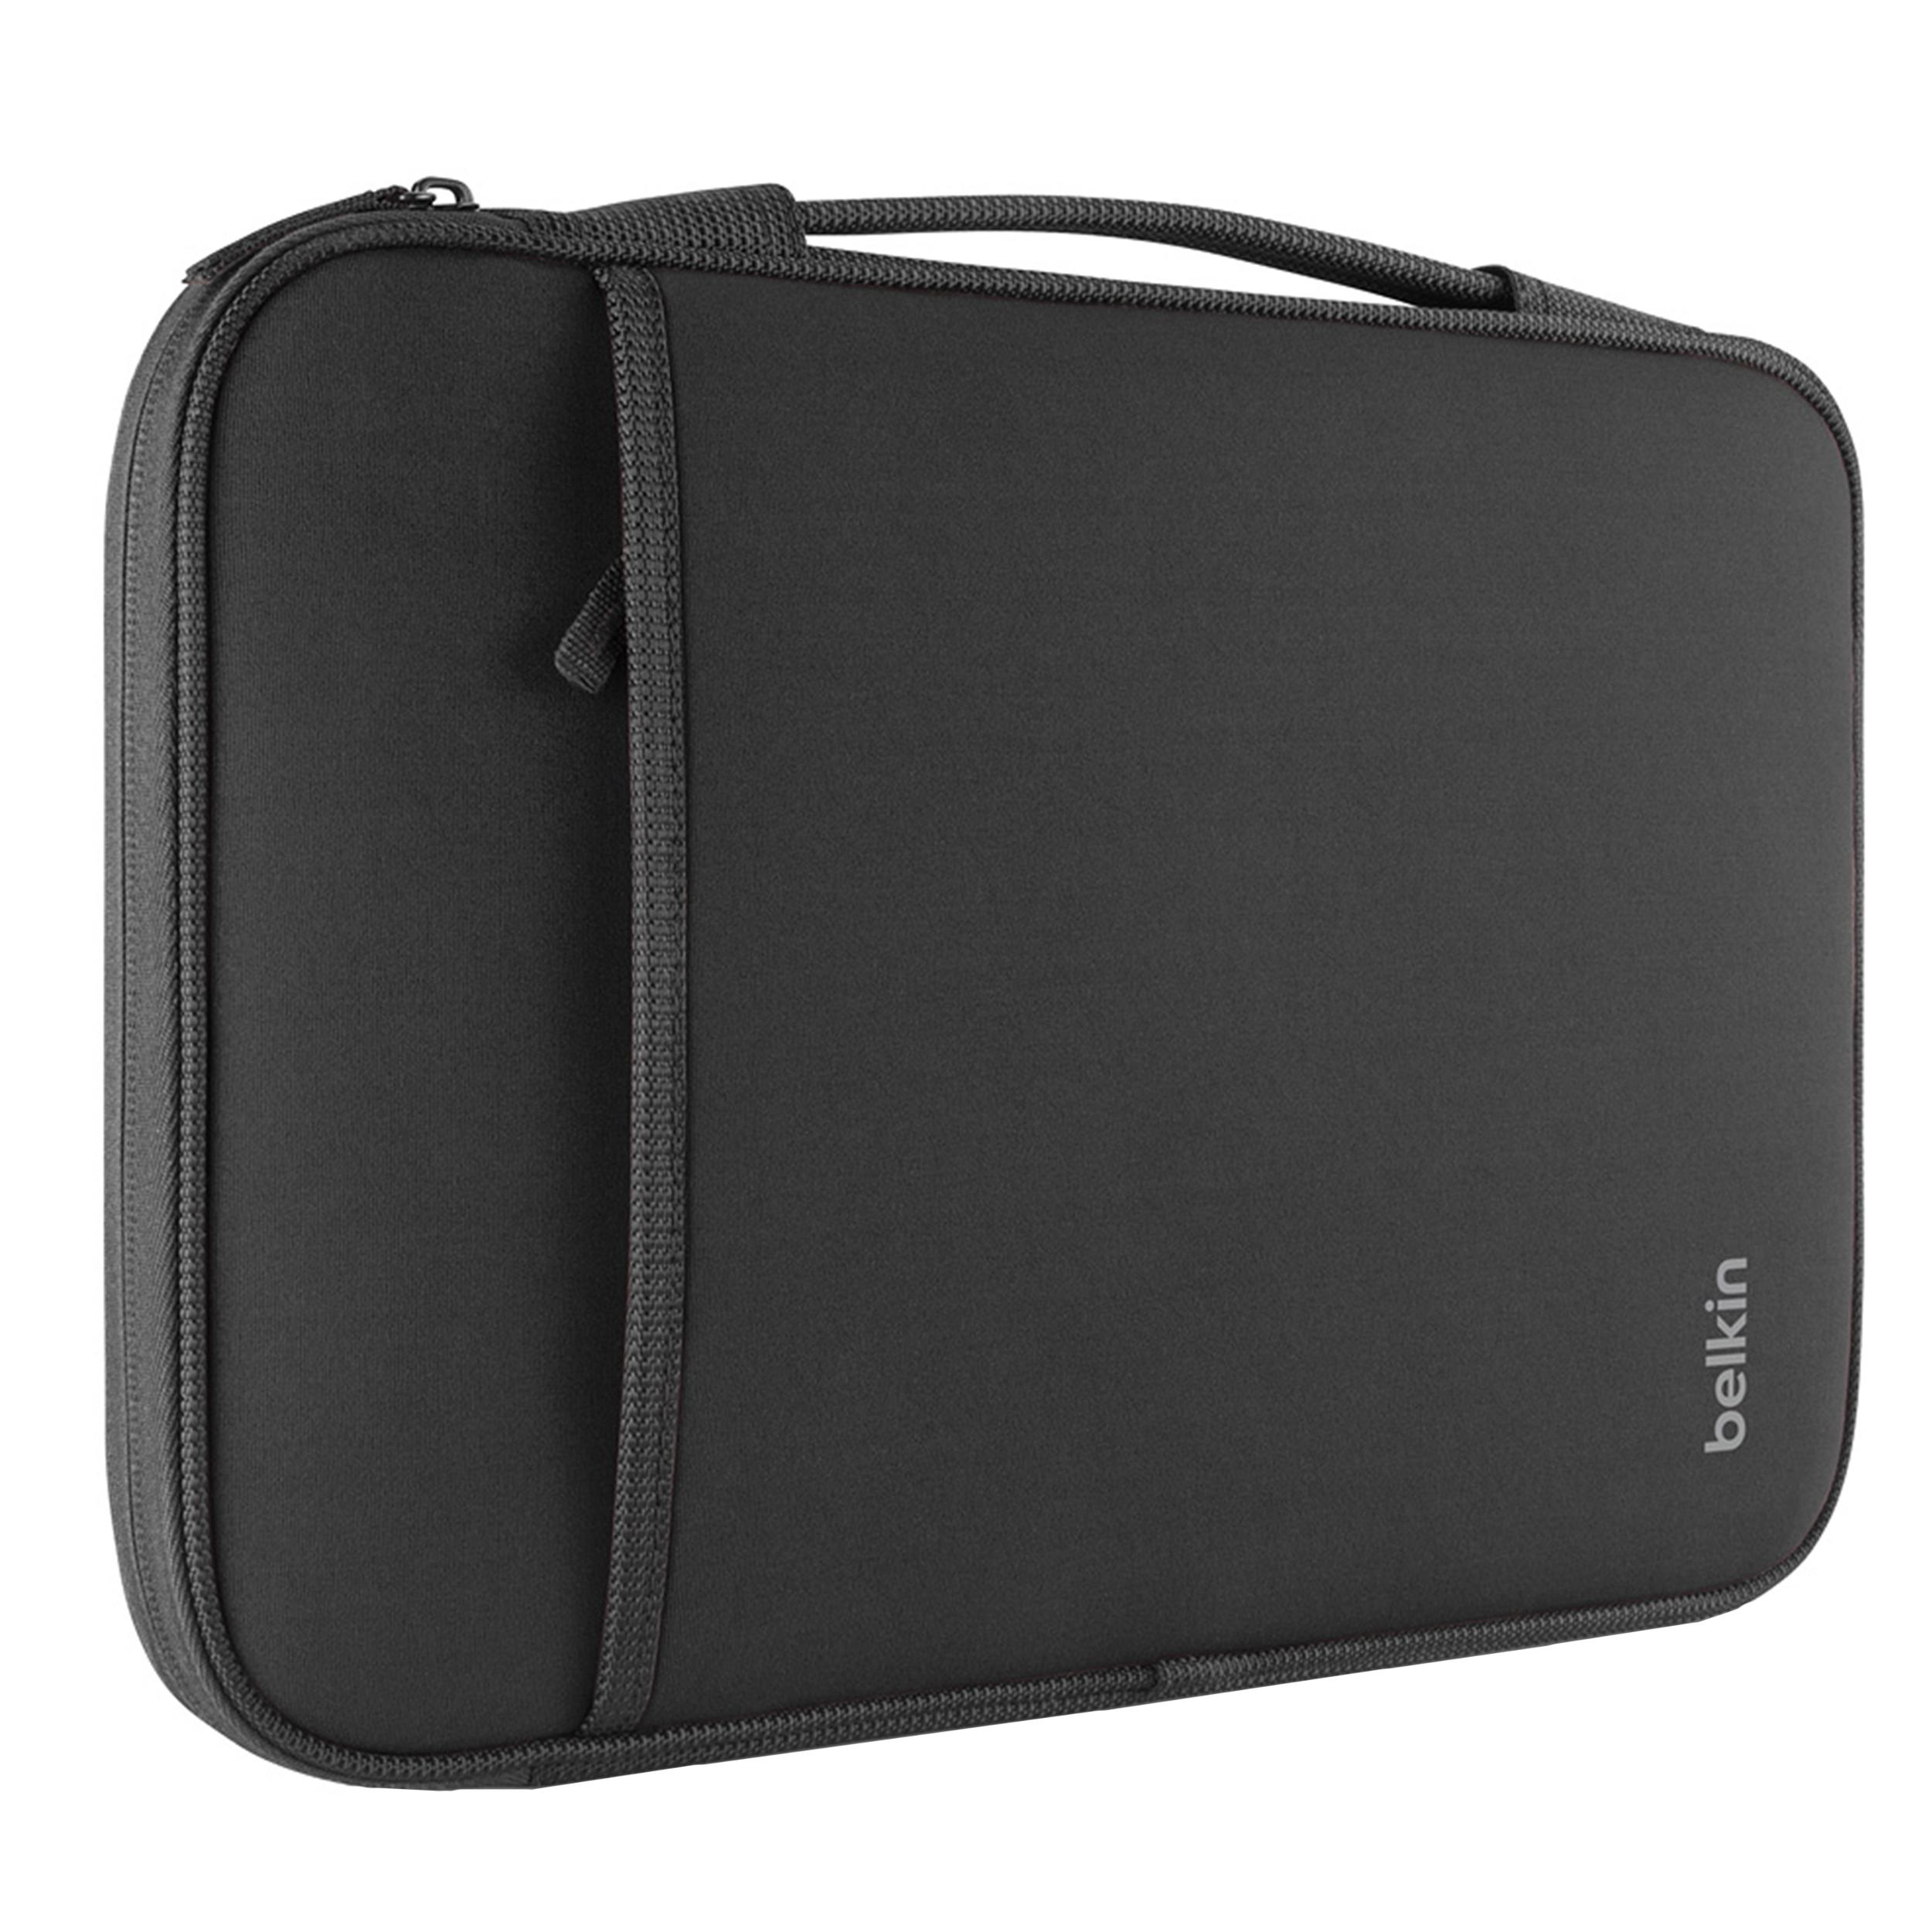 کاور لپ تاپ بلکین مدل B2B064-C00 مناسب برای لپ تاپ اپل 13 Mac Book Air